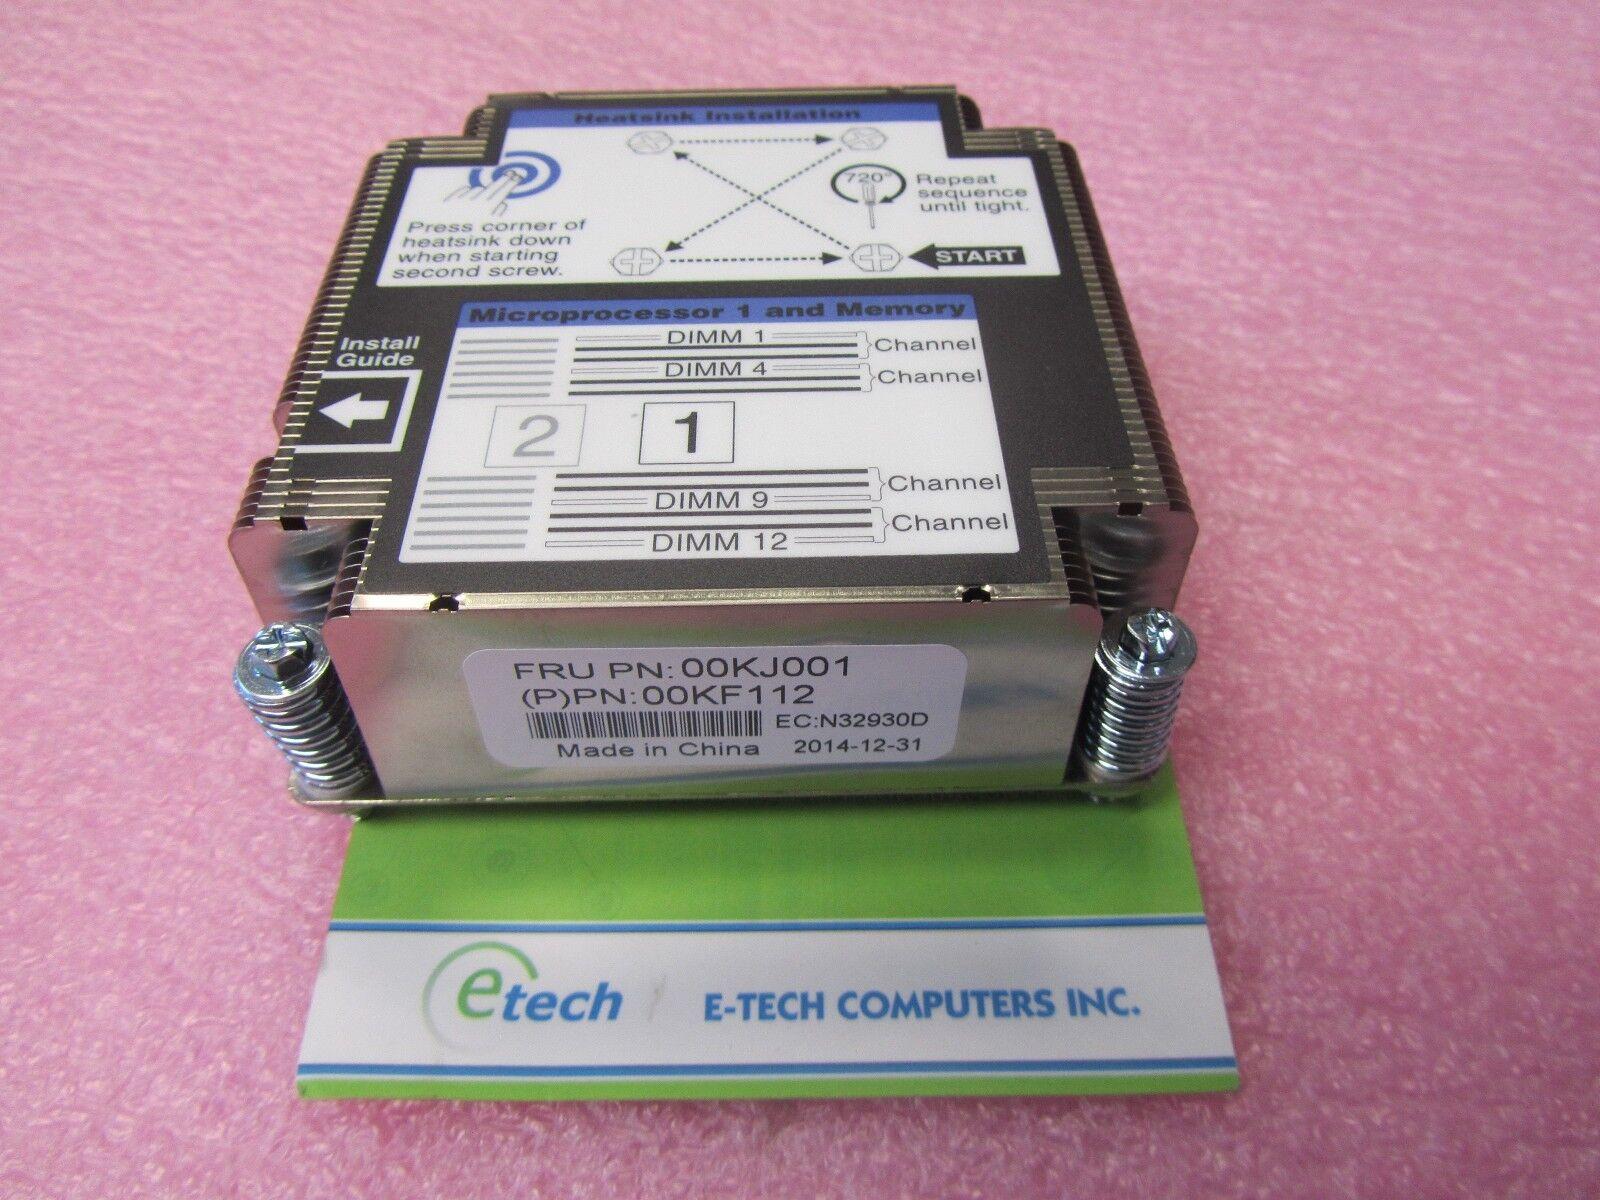 00KJ001 - IBM Lenovo Flex System x240 M5 CPU 1 Heatsink, 135W TDP